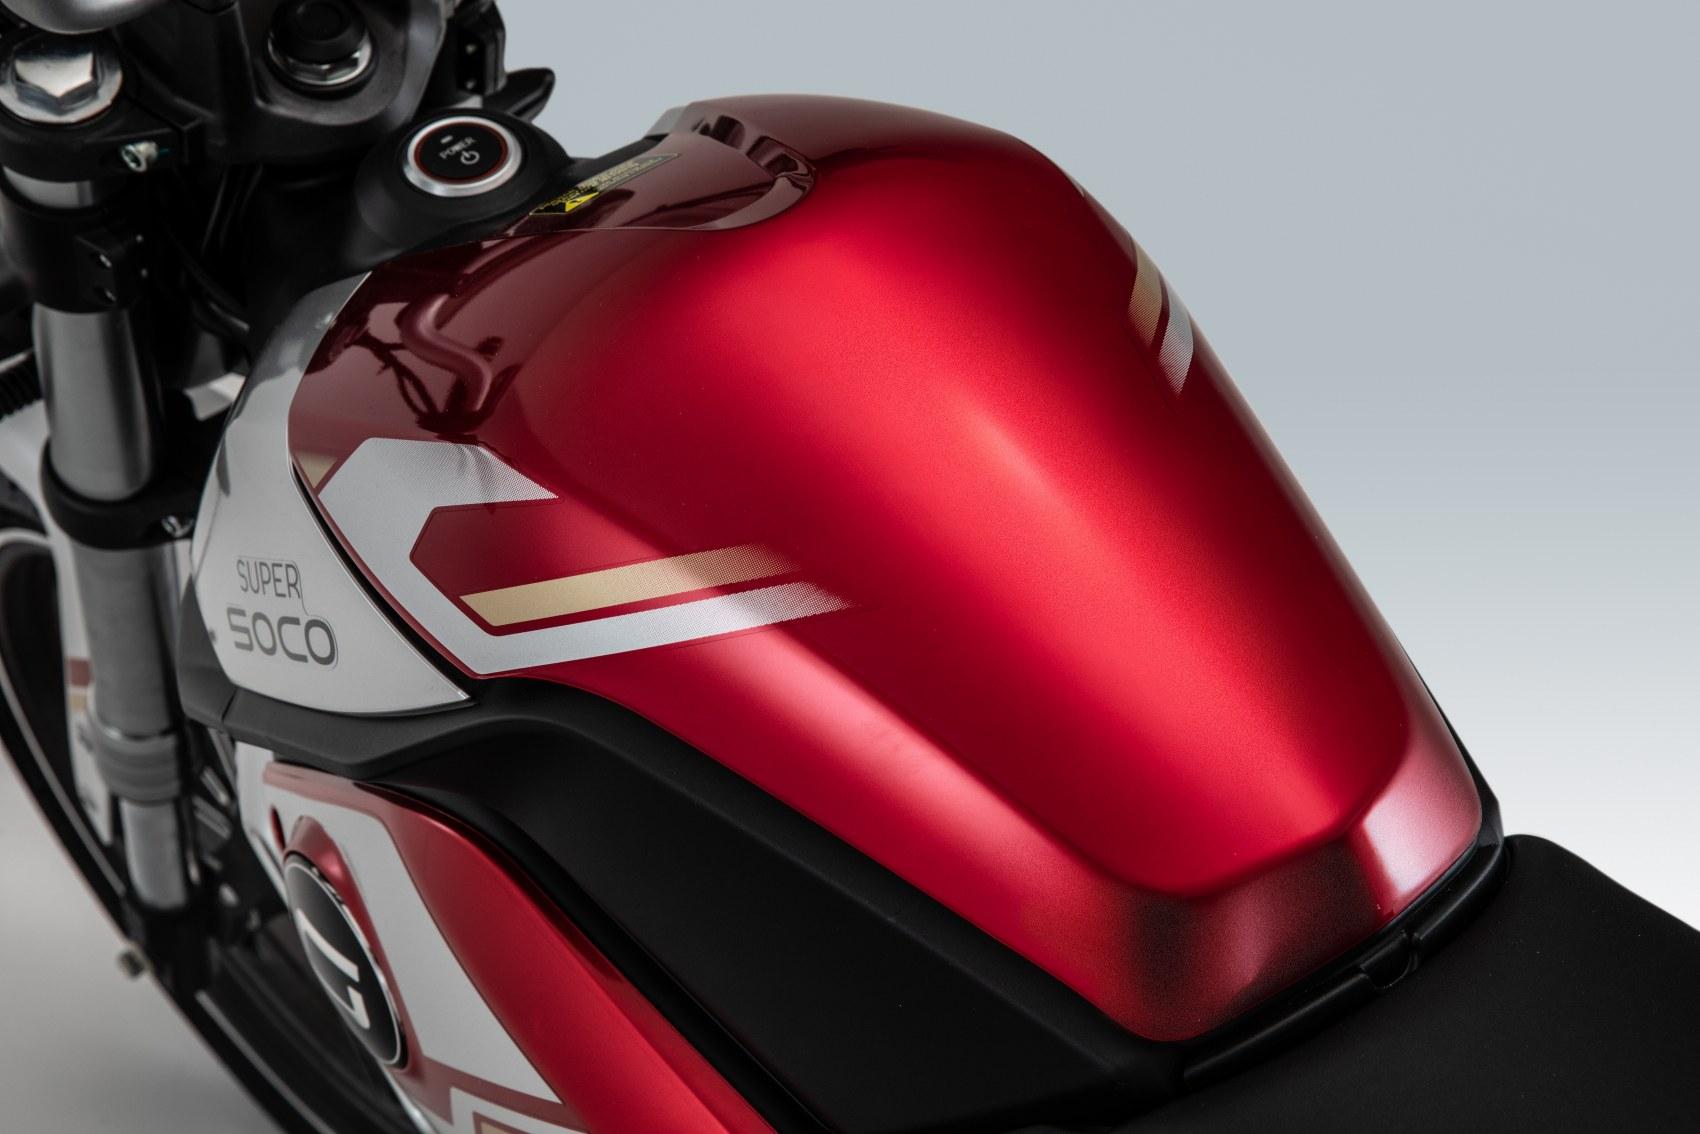 Super Soco TSx electric motorcycle tank unit